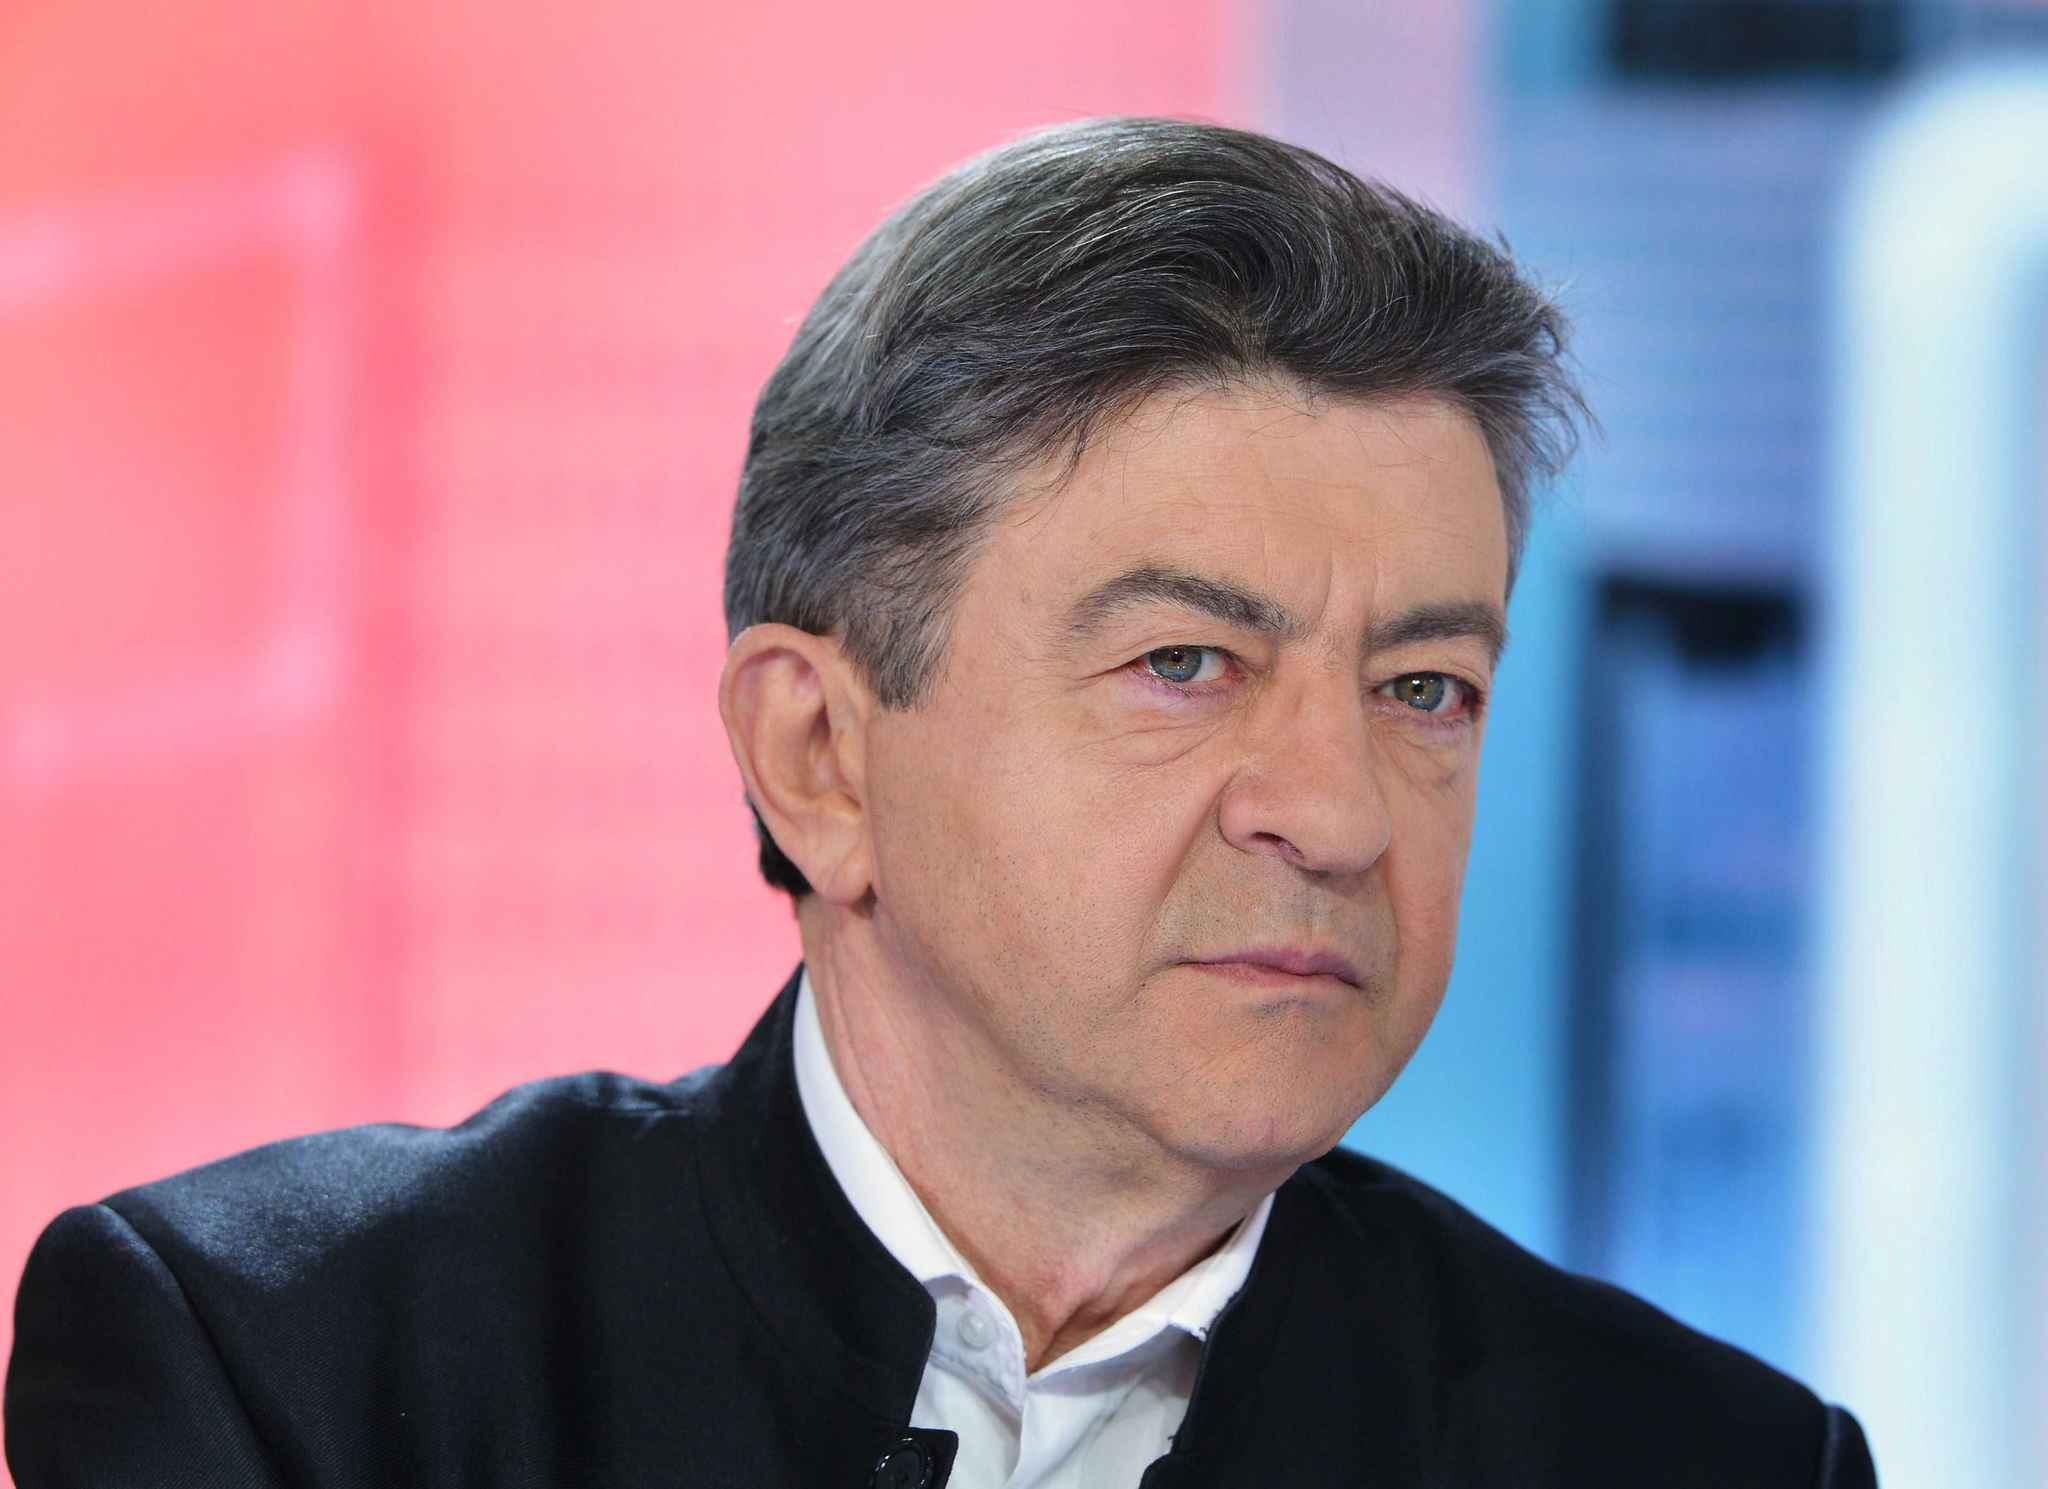 politique article jean melenchon annonce candidat election presidentielle